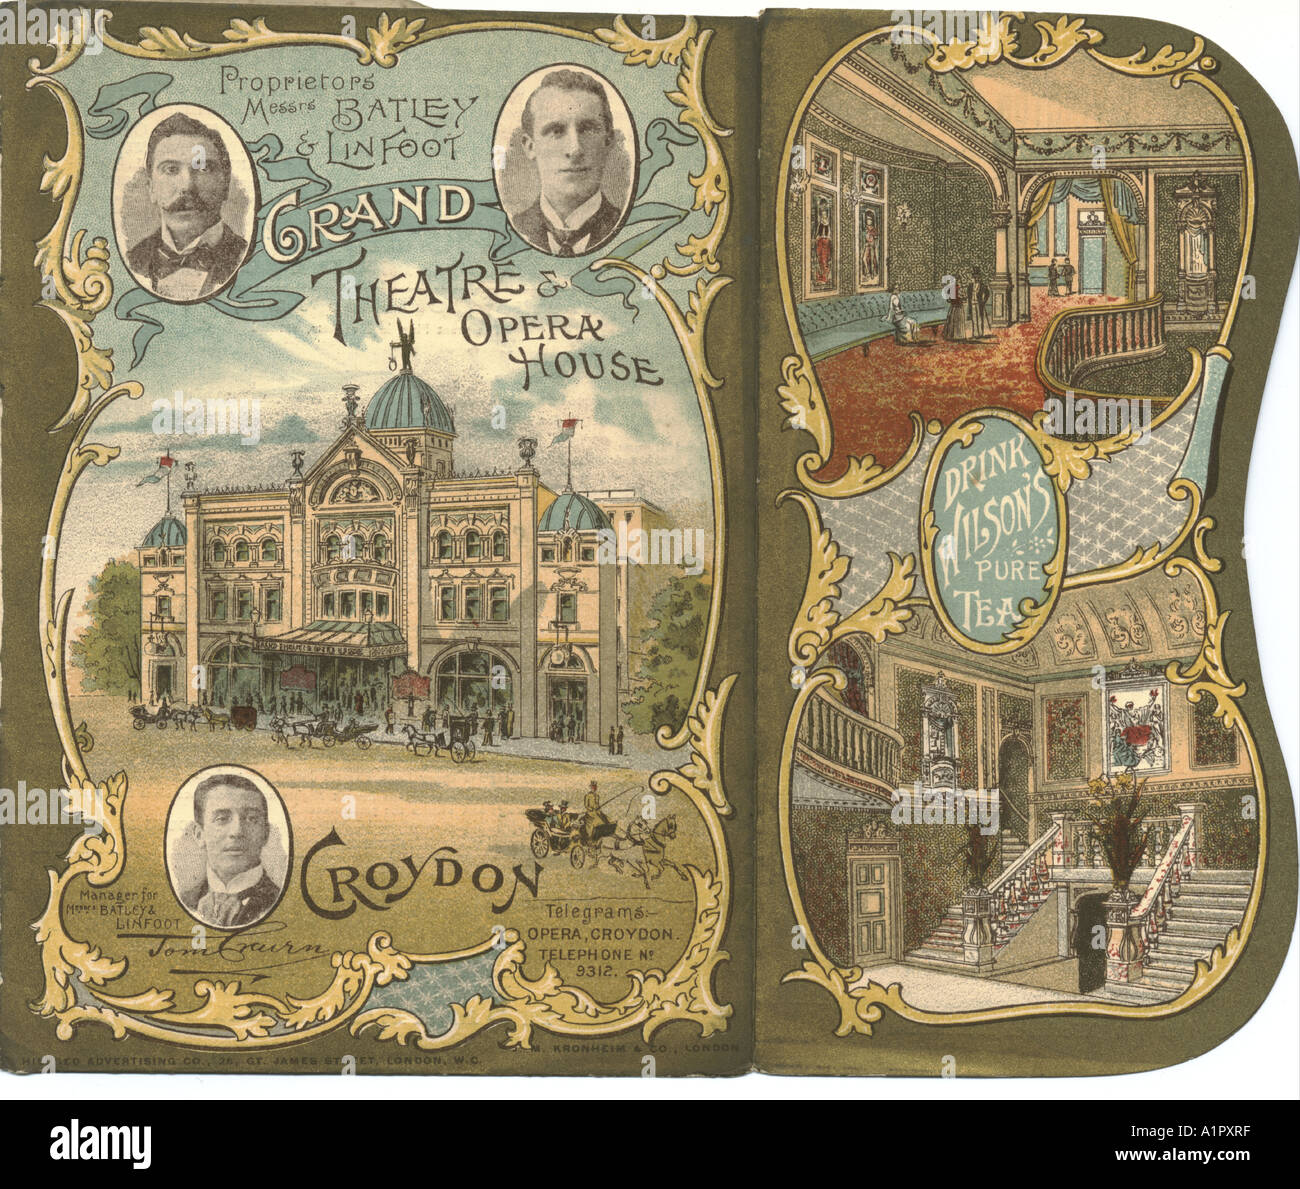 Grand Theatre & Opera House, Croydon, programme 1897 - Stock Image